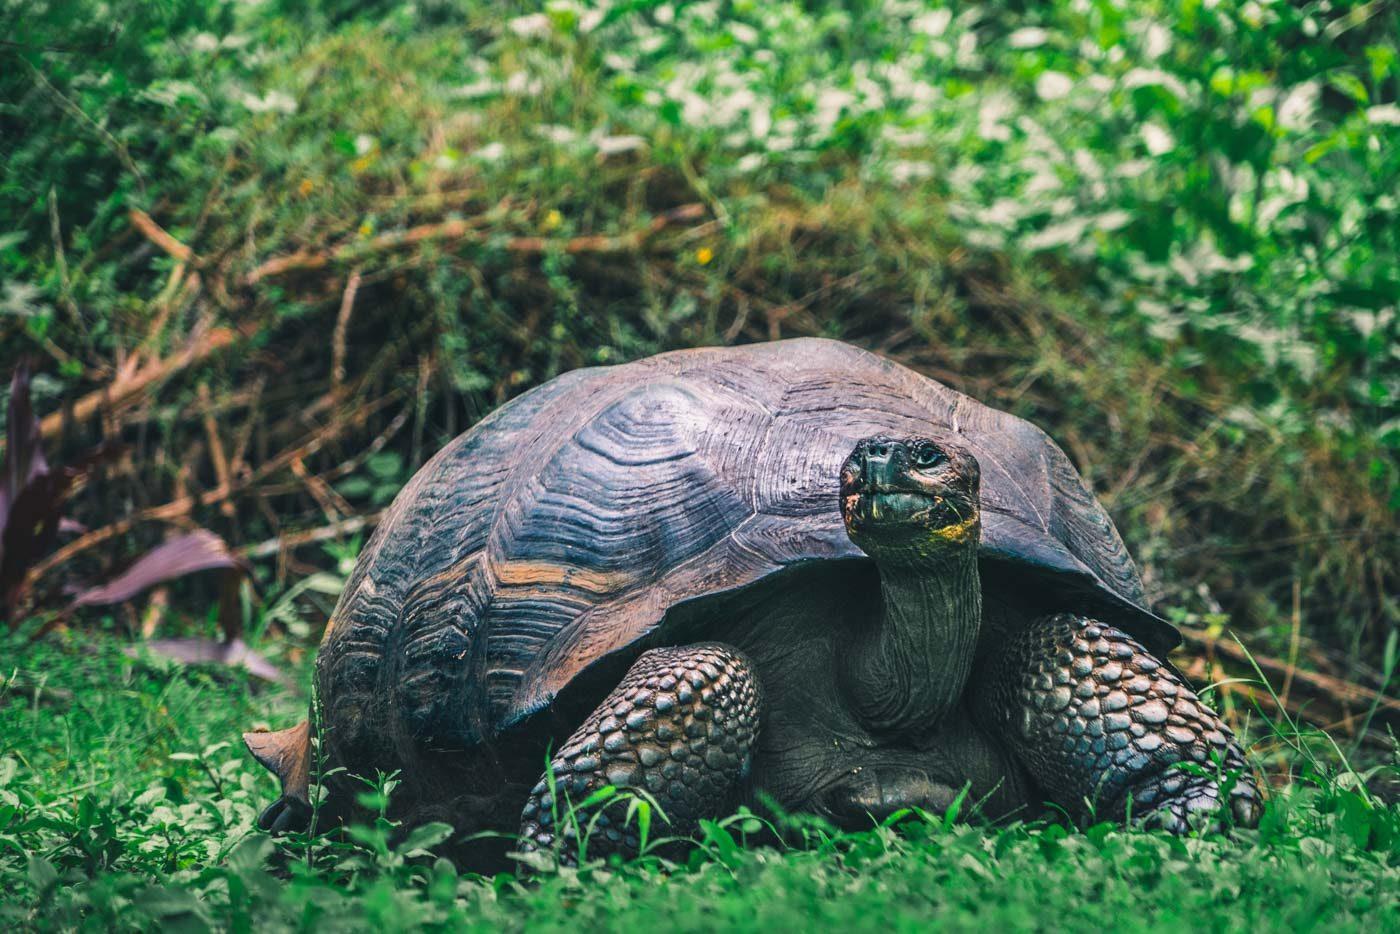 Tortoise on Santa Cruz Island, Galapagos